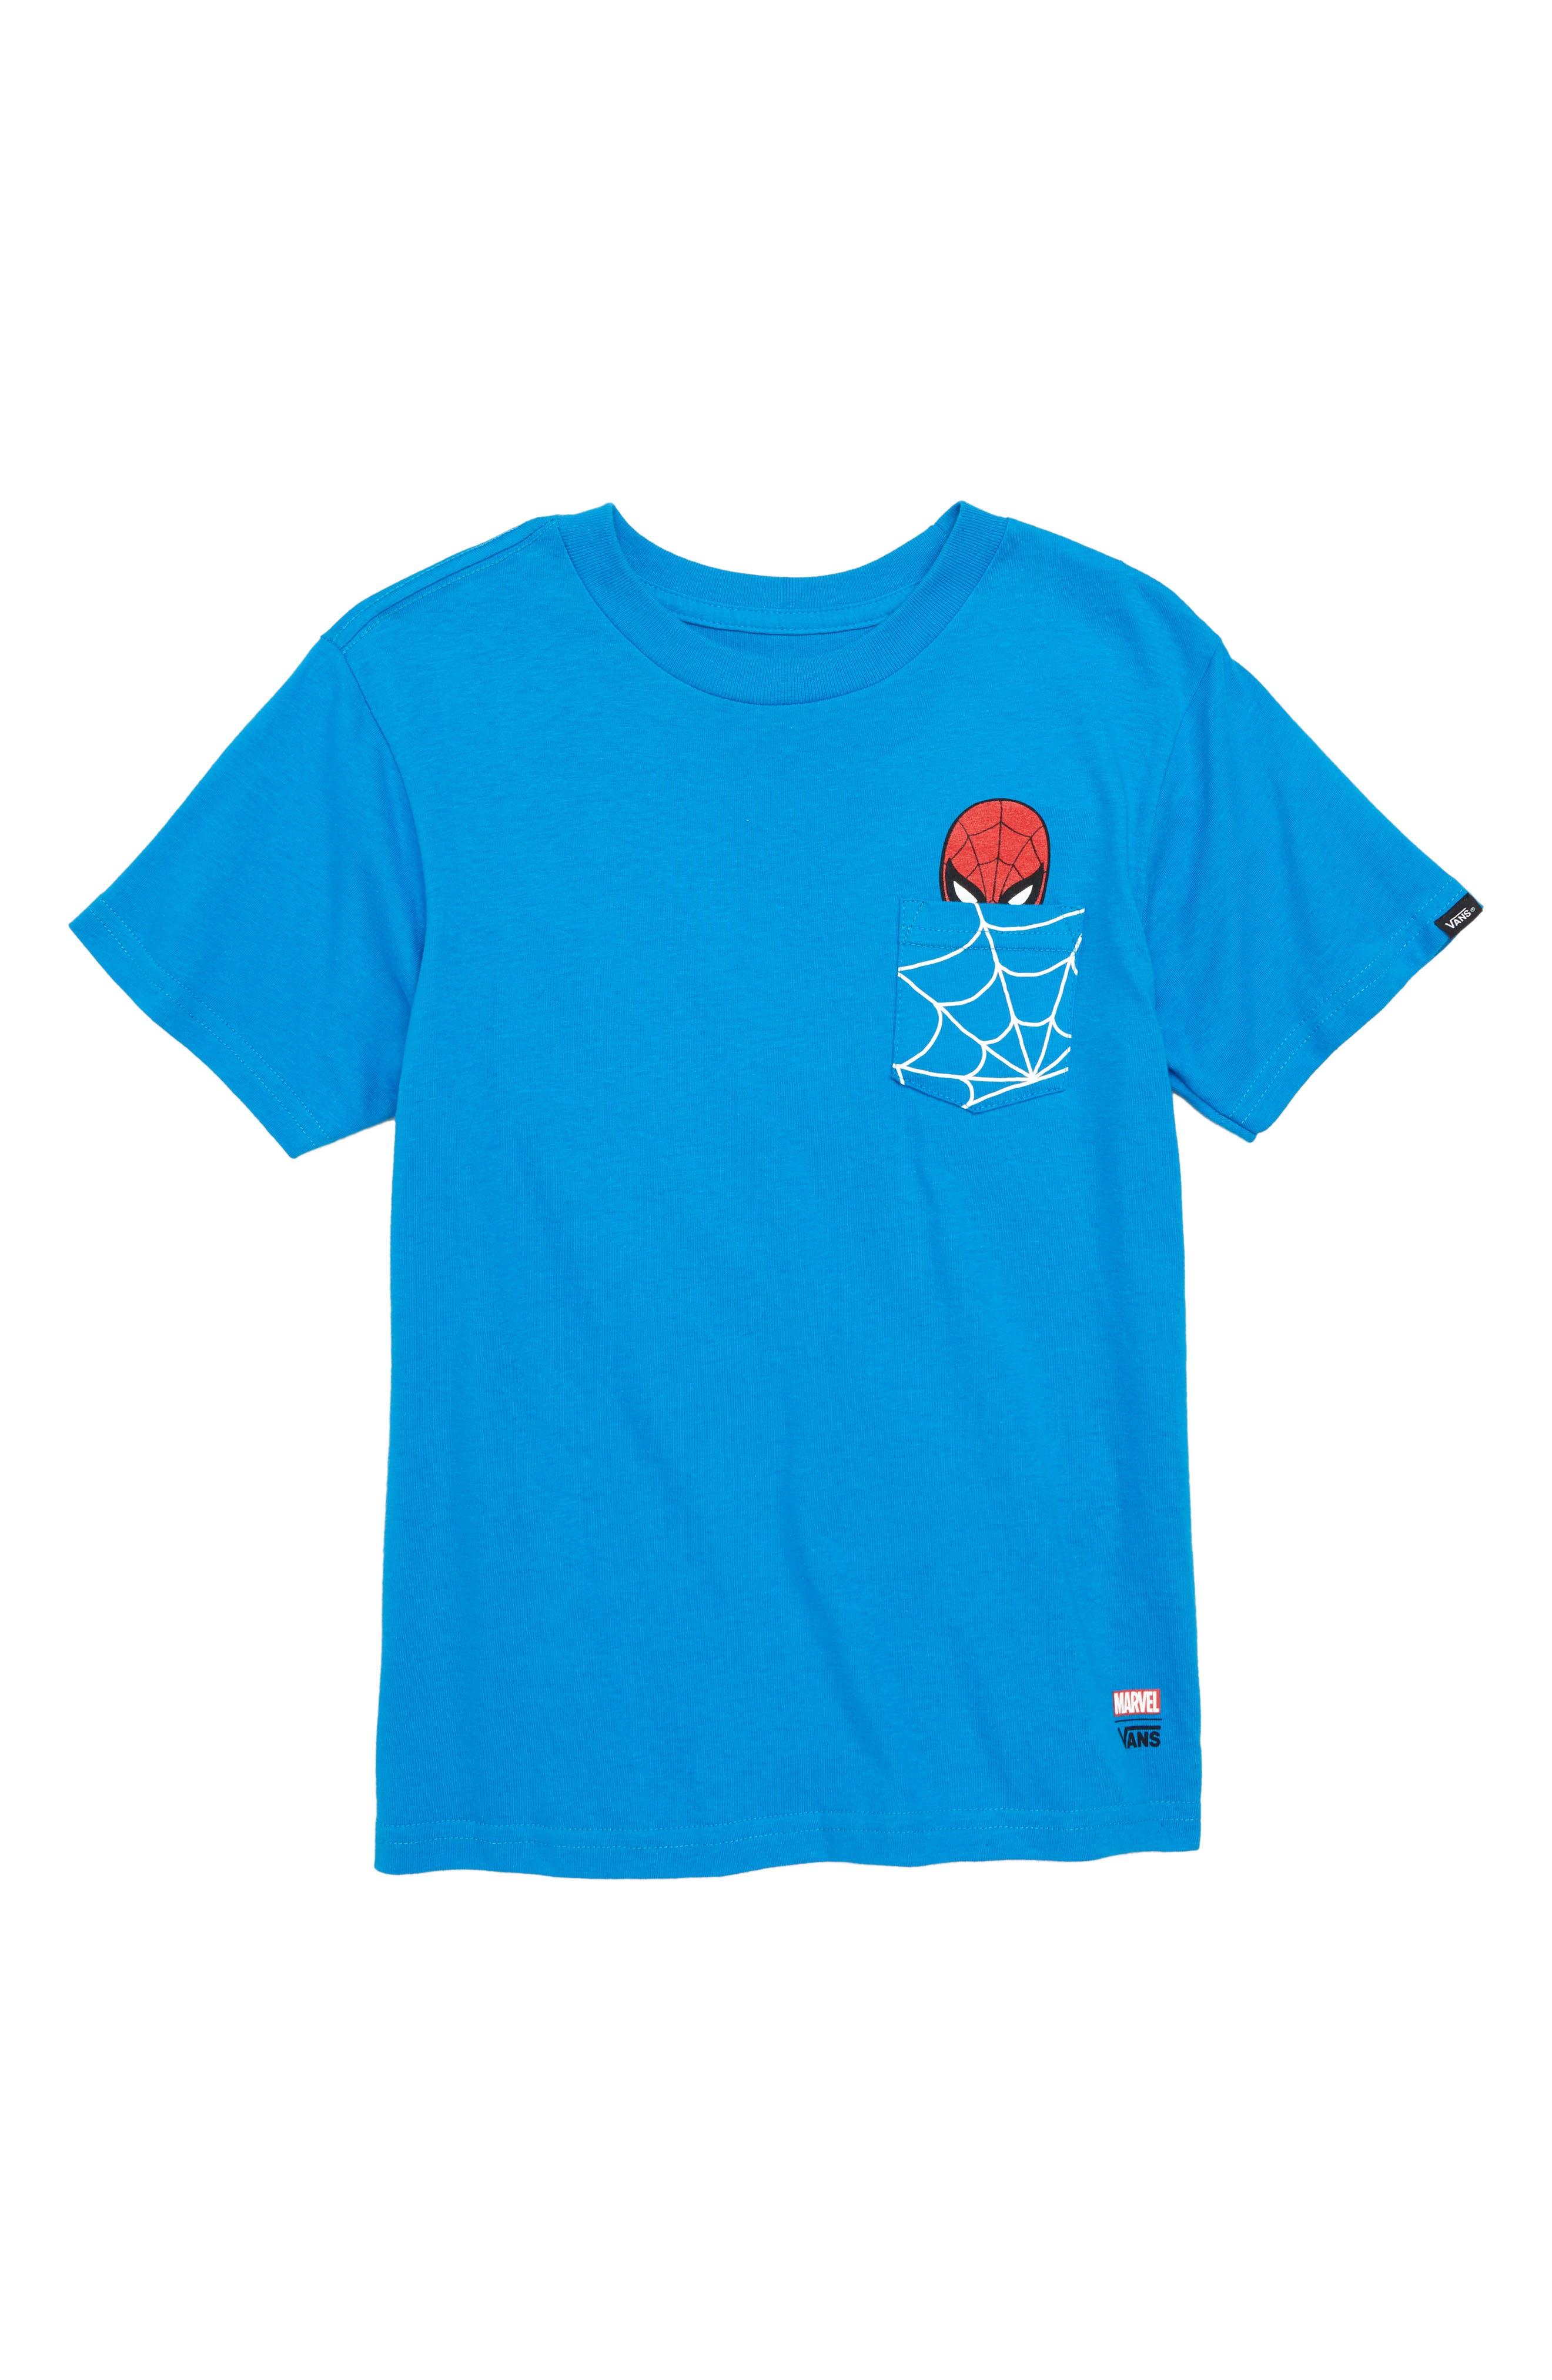 x Marvel<sup>®</sup> Avengers Spider-Man<sup>™</sup> Pocket T-Shirt,                         Main,                         color, 420